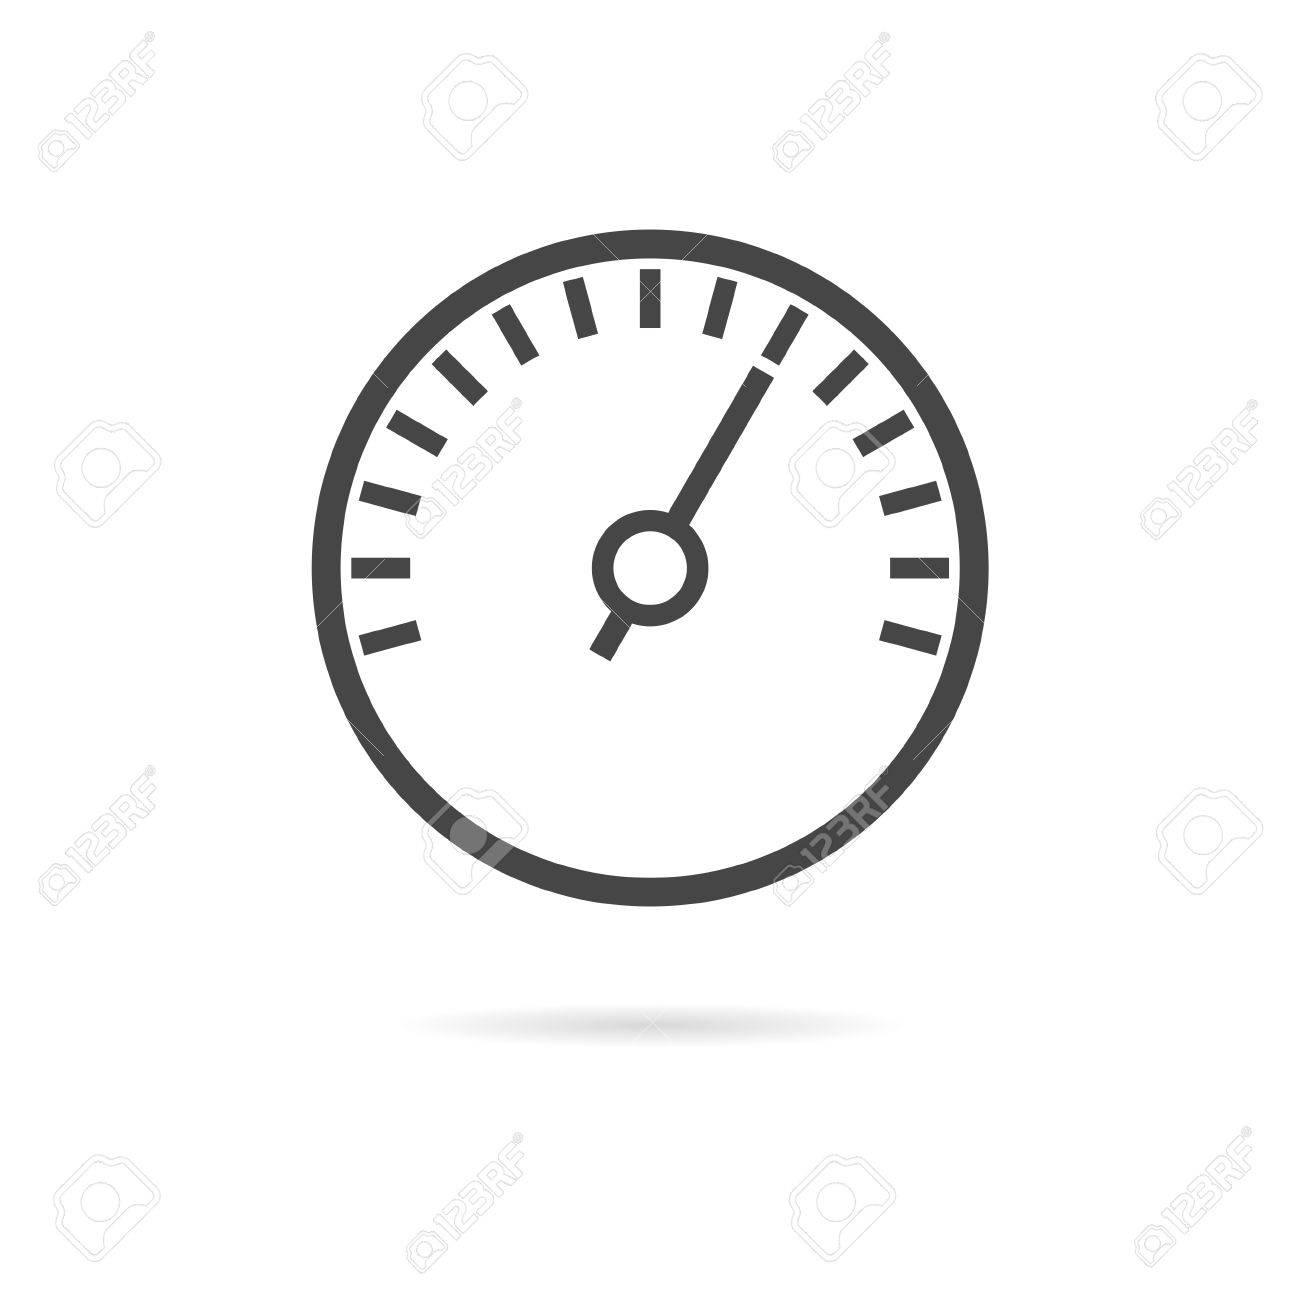 Meter Icons, Symbols Of Speedometers, Manometers Royalty Free ...